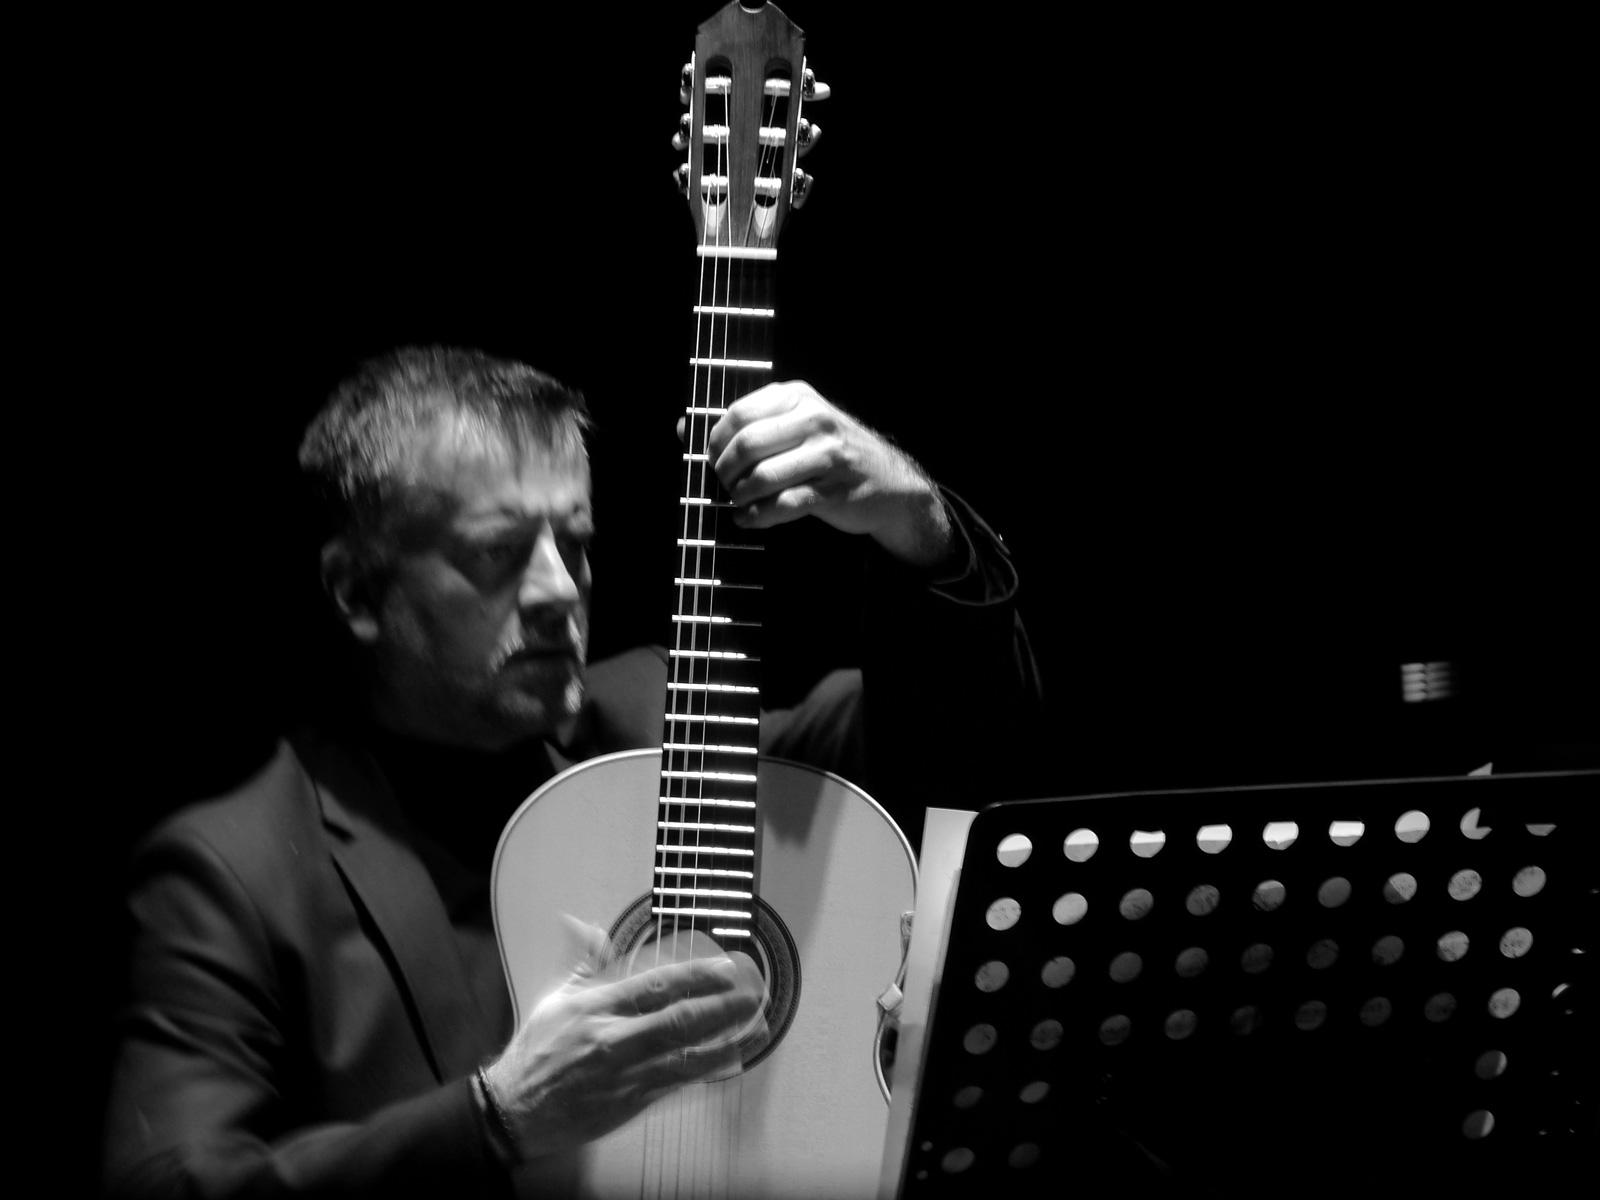 Arturo Tallini fiero